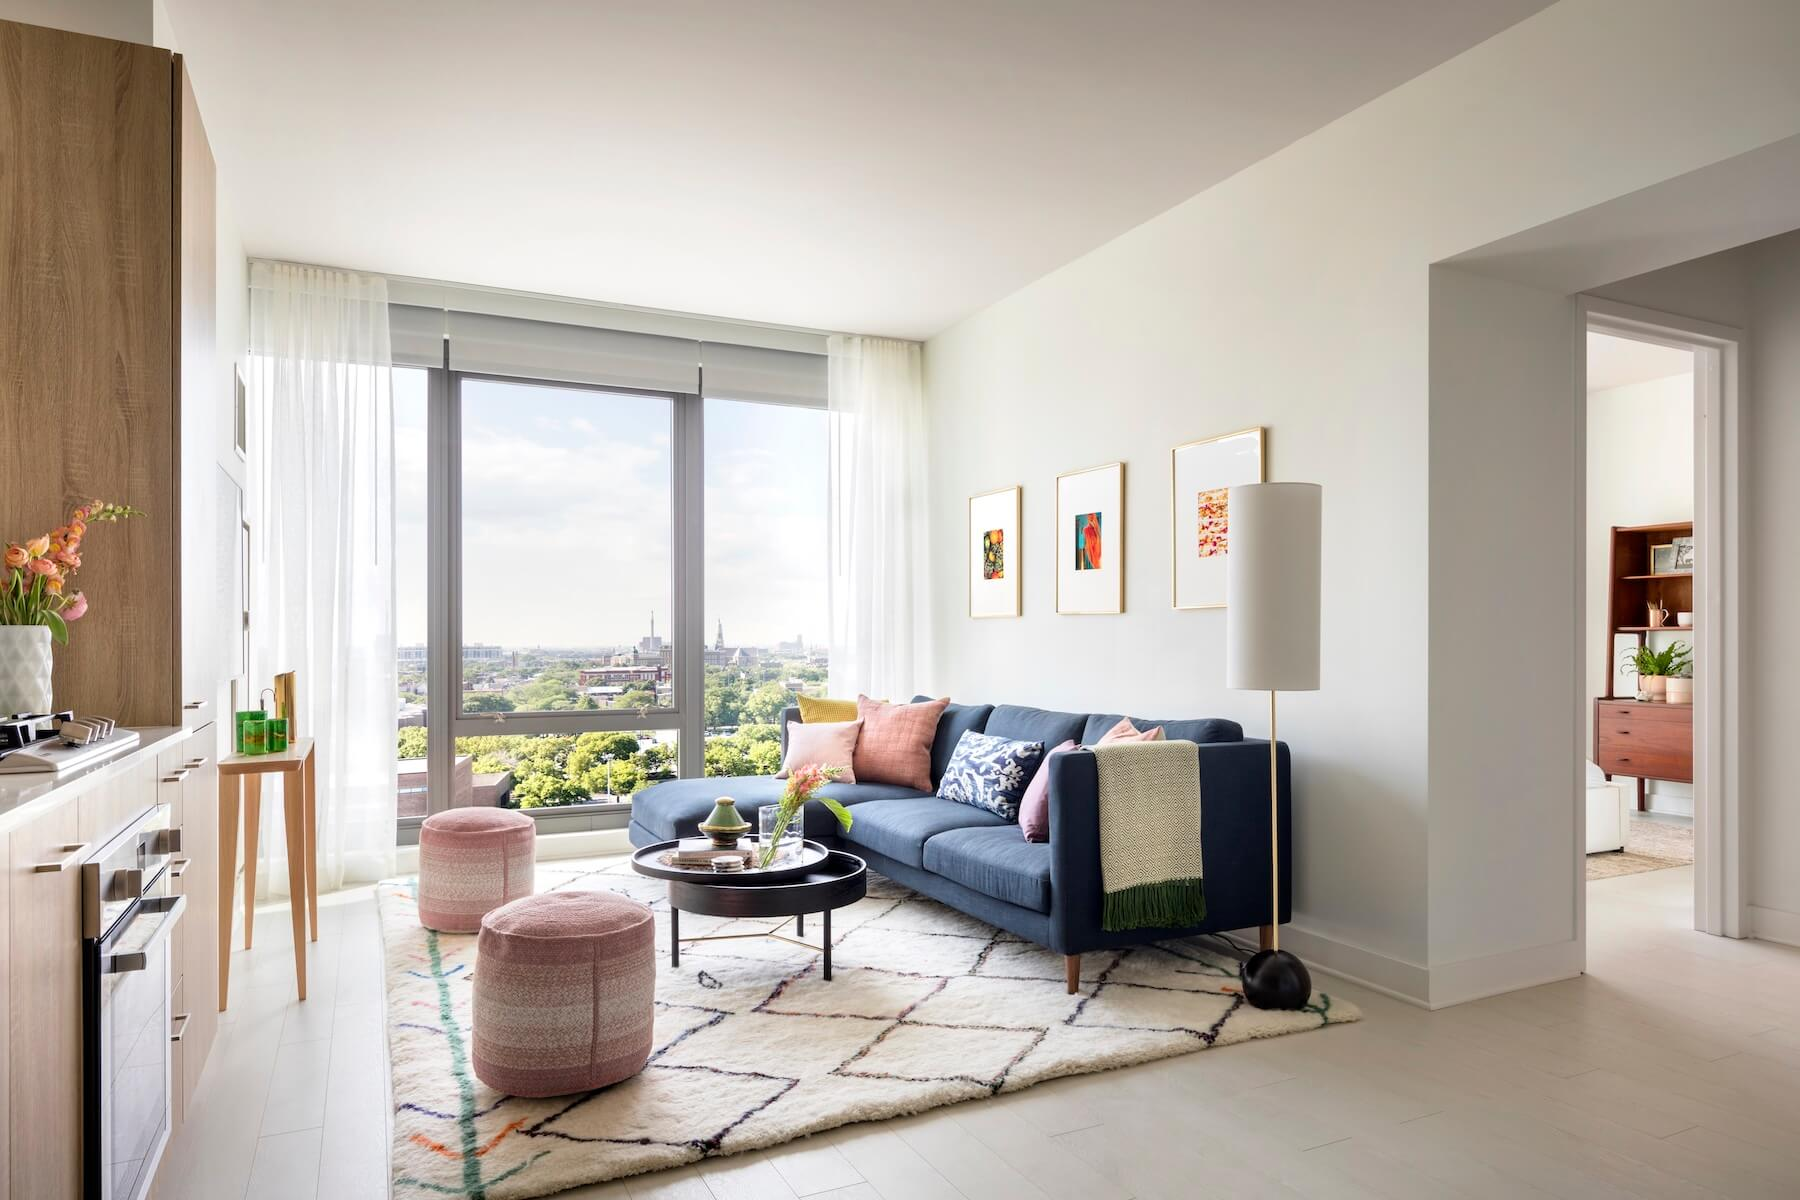 Best apartment search website in Chicago - Landmark West Loop